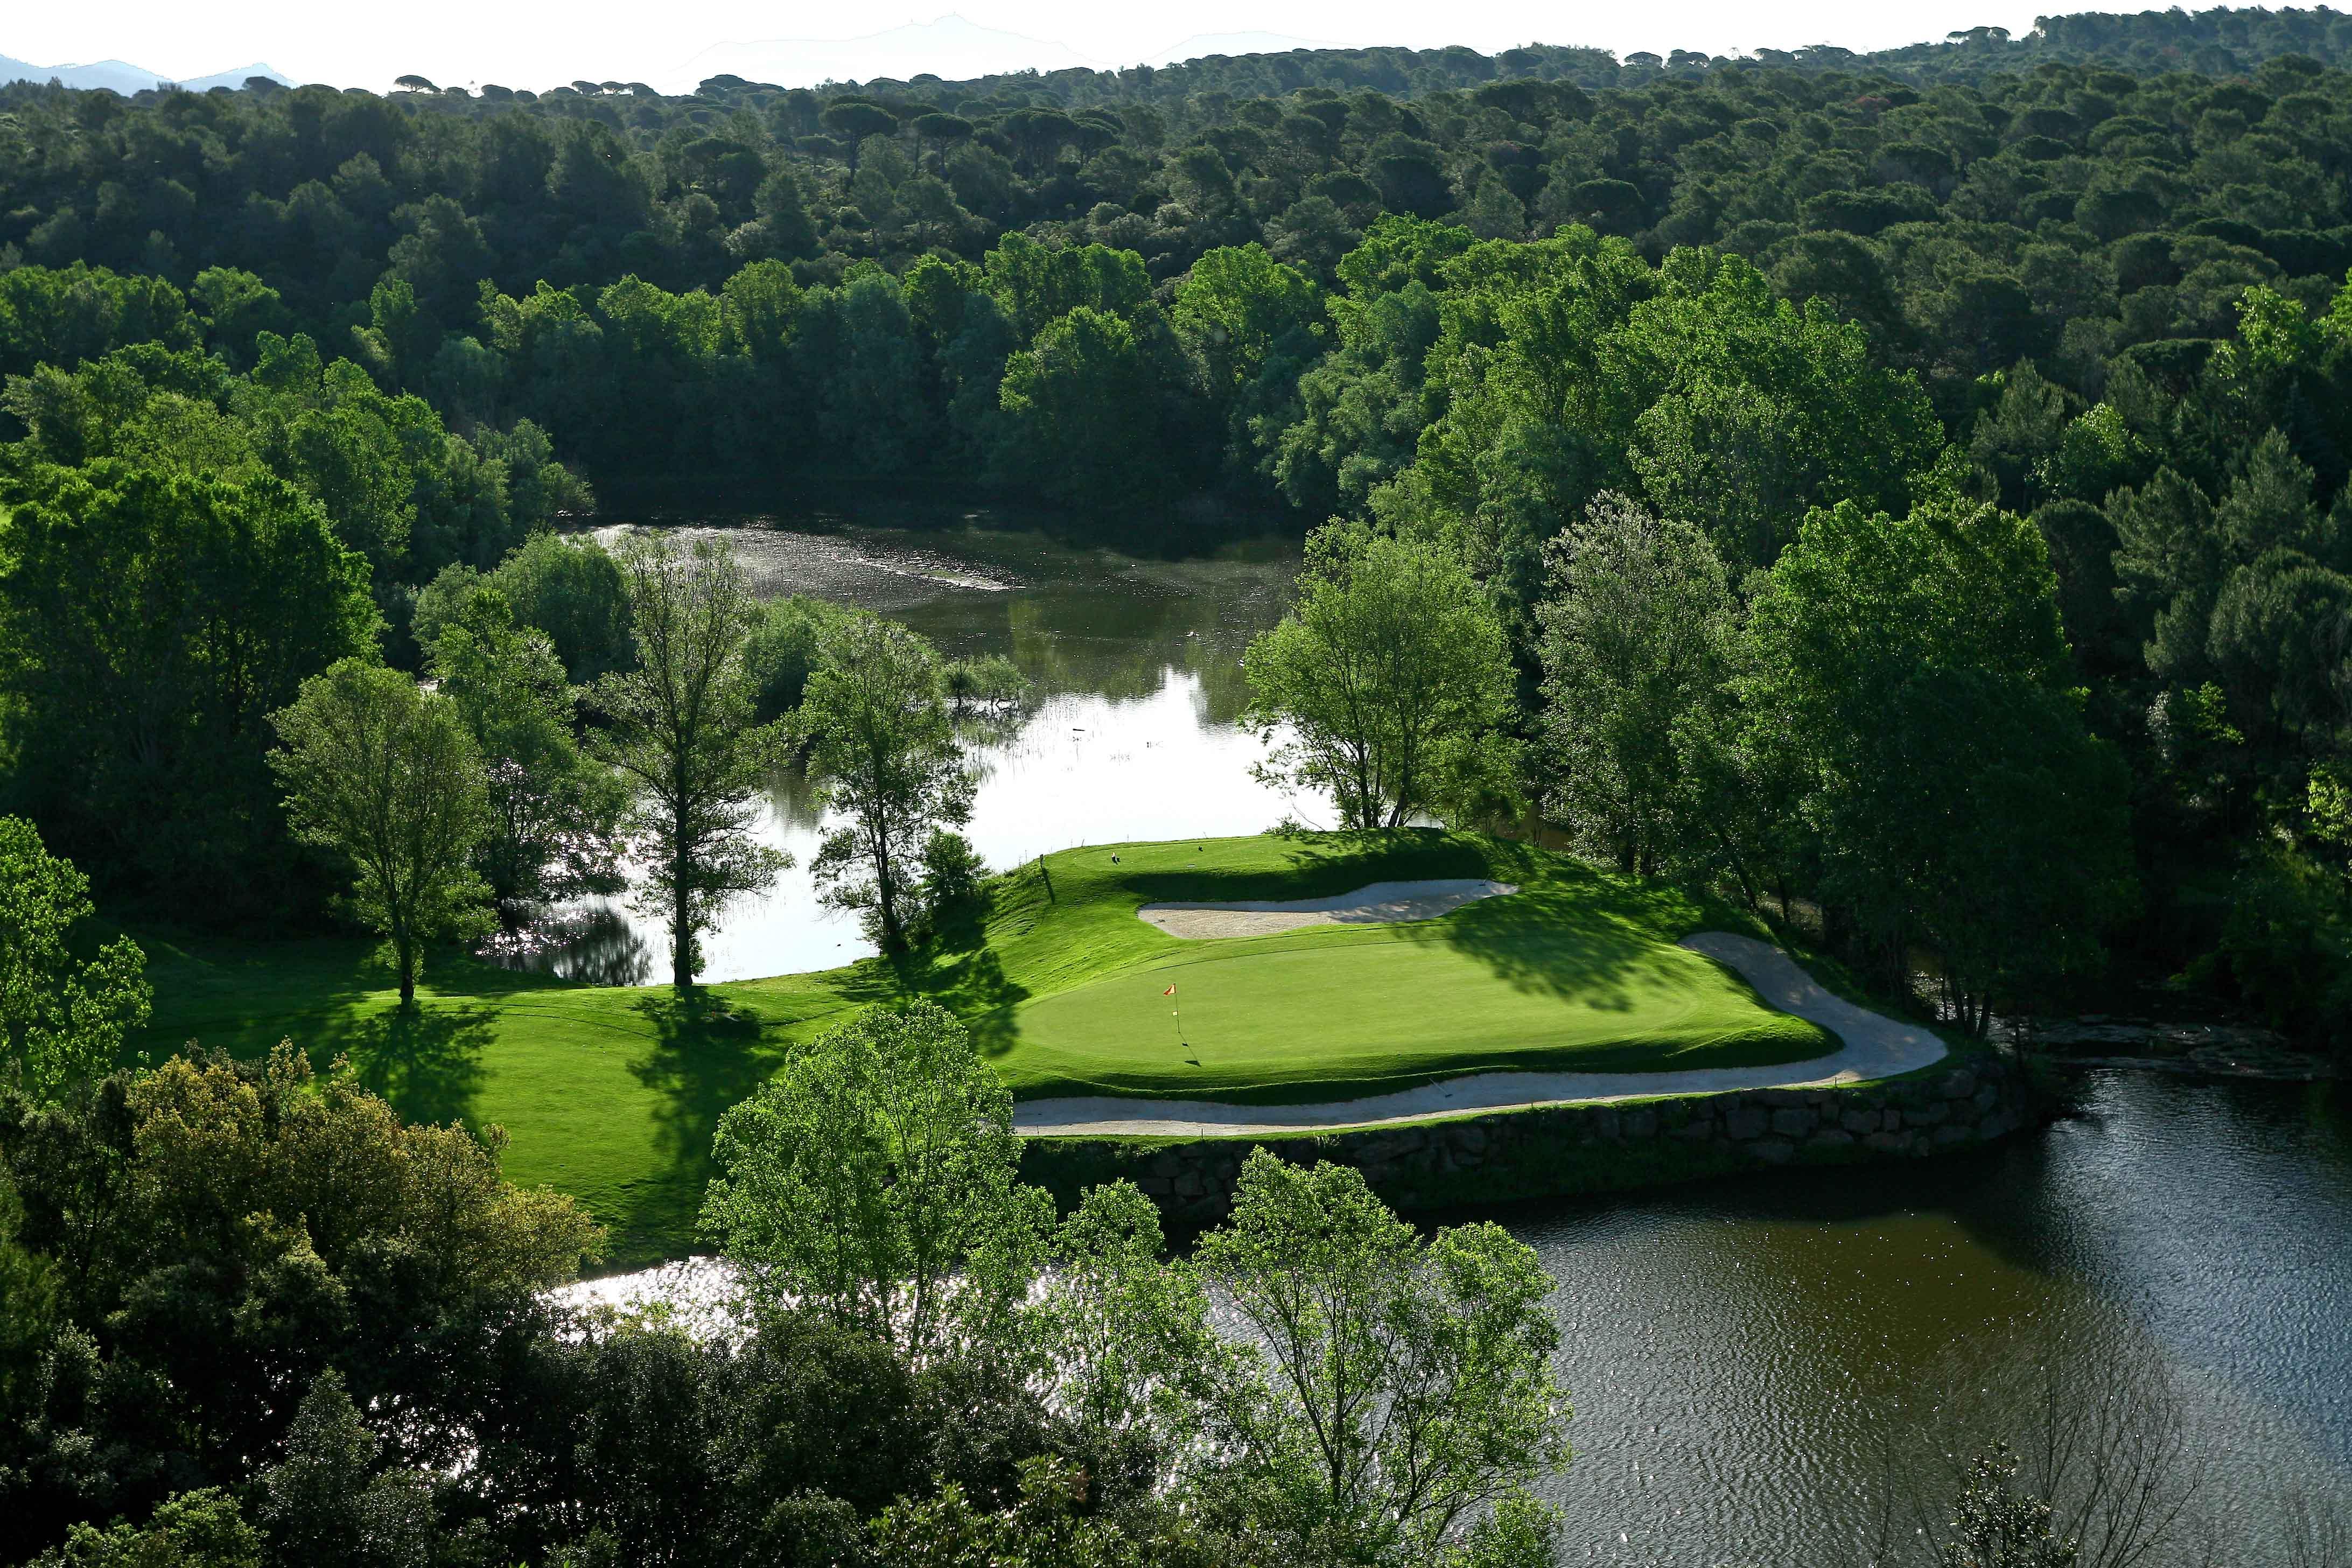 golf-expedition-golf-reizen-frankrijk-regio-cote-d'azur-Les-Domaines-de-Saint-Endréol-Golf-en-Spa-Resort-golfbaan-hole